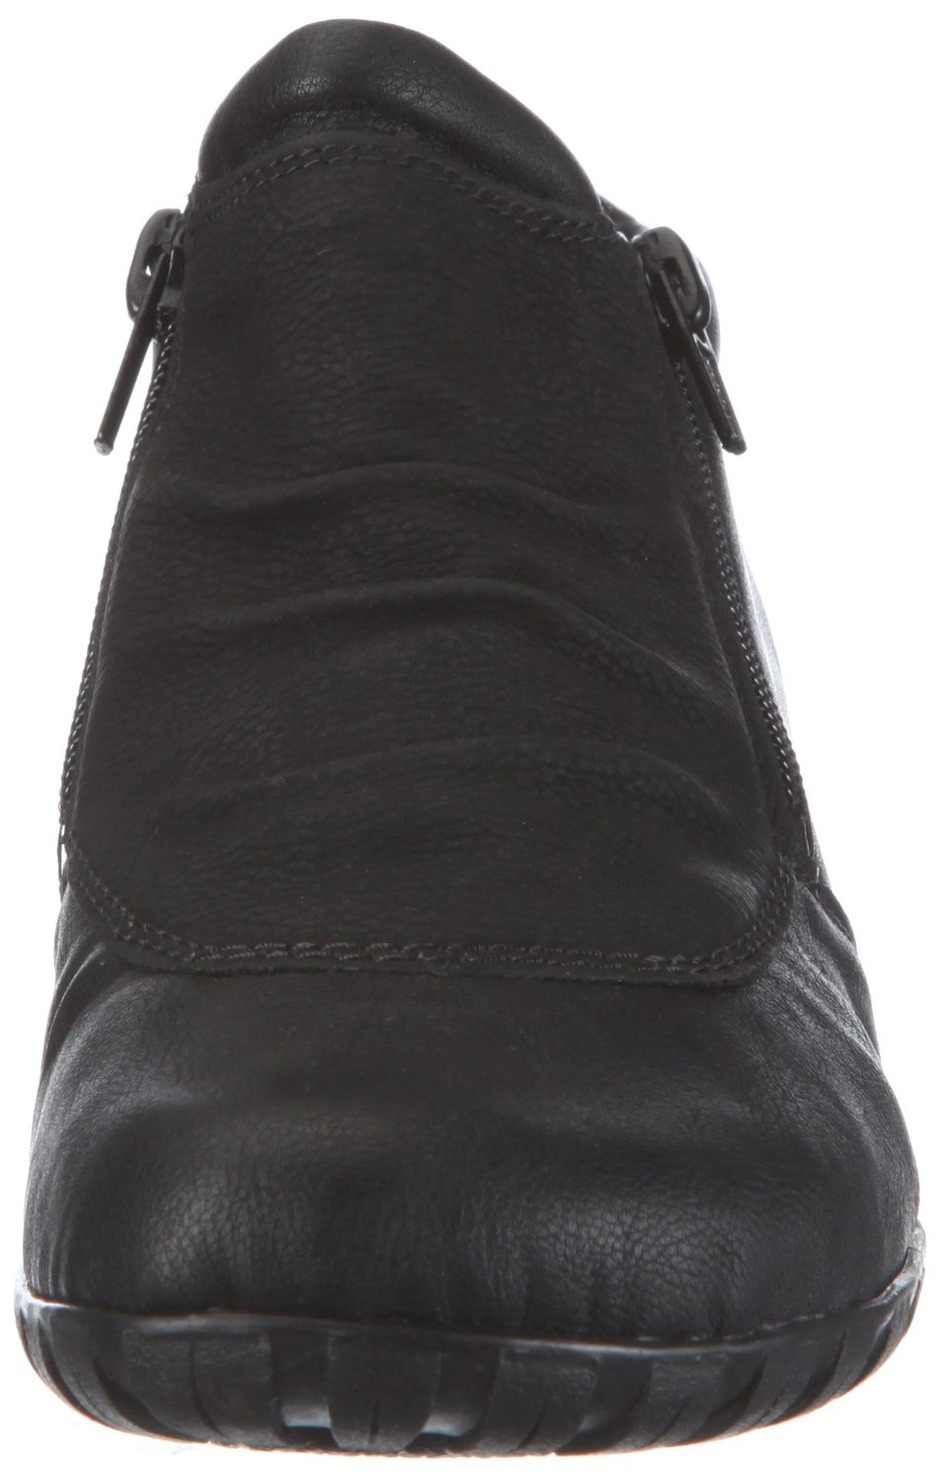 ded89e8d40c6 Soňa - Dámska obuv - Kotníčky - Čierne zateplené členkové topánky Rieker